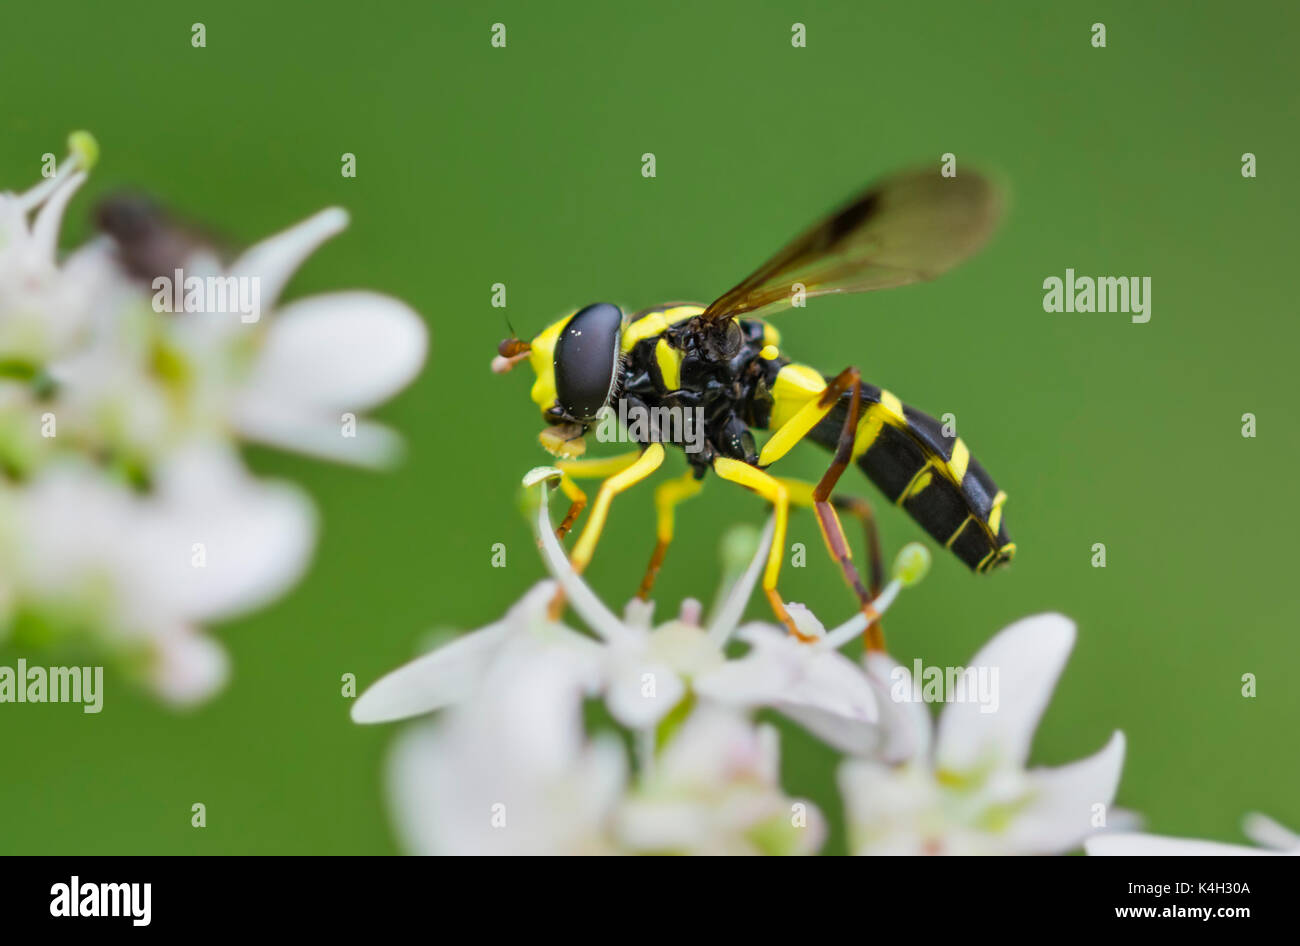 xanthogramma-pedissequum-adult-male-wasp